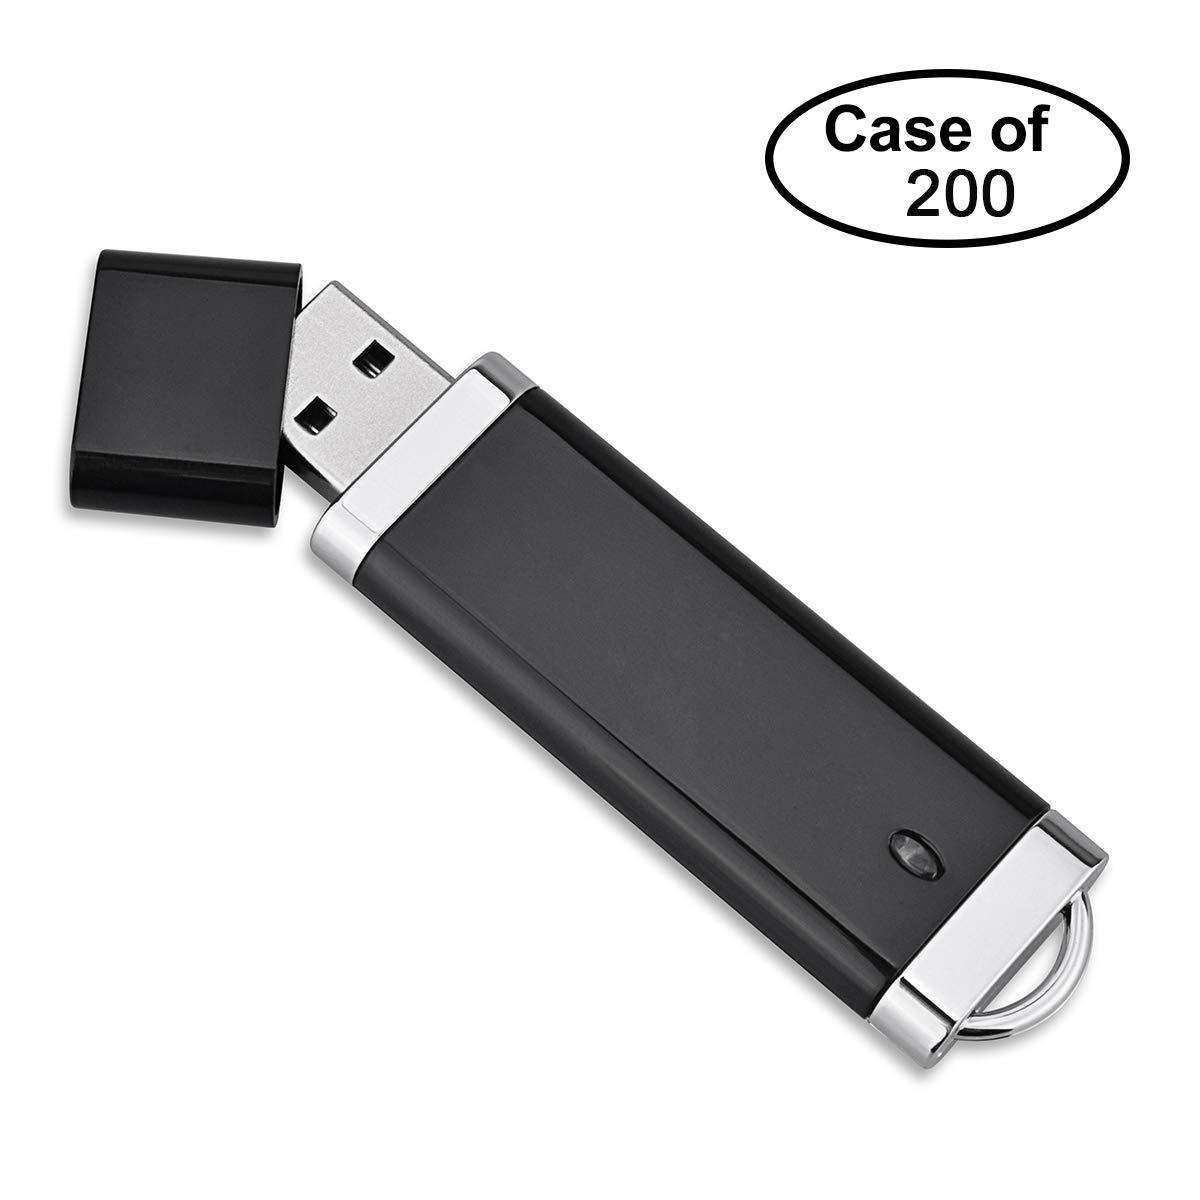 Case of 200, TOPESEL 4GB USB 2.0 Flash Drives Bulk Pack USB Memory Stick Data Storage Thumb Drive Zip Drive,Black